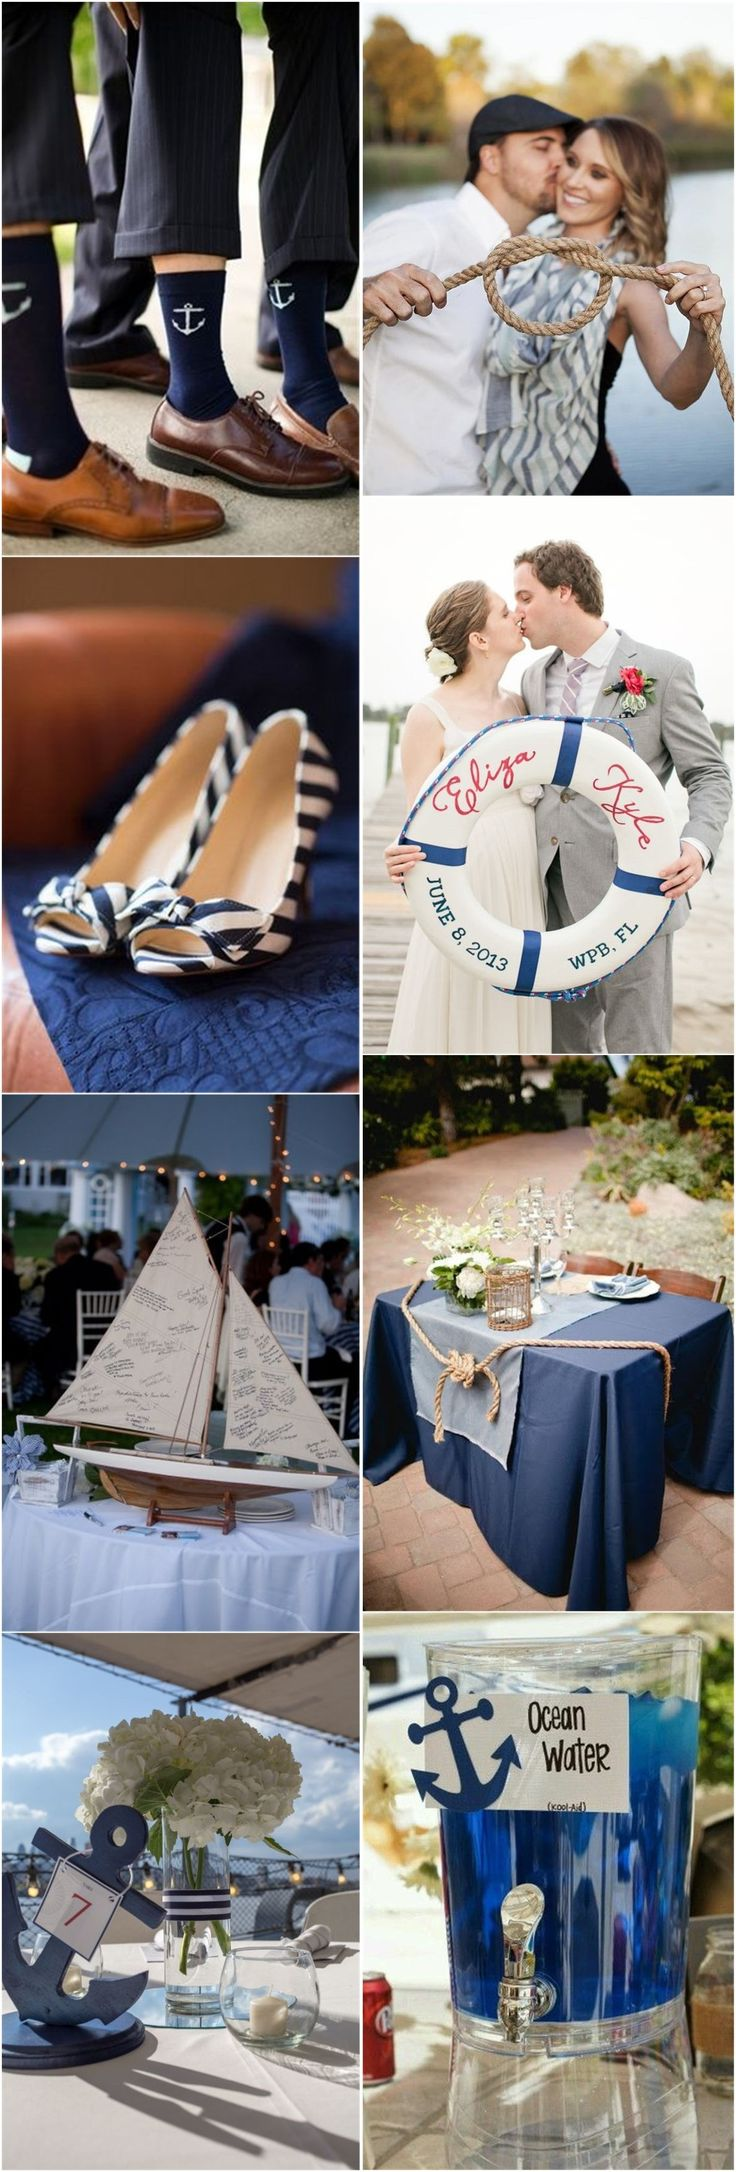 small beach wedding ceremony ideas%0A    Nautical Wedding Ideas to Rock Your Big Day